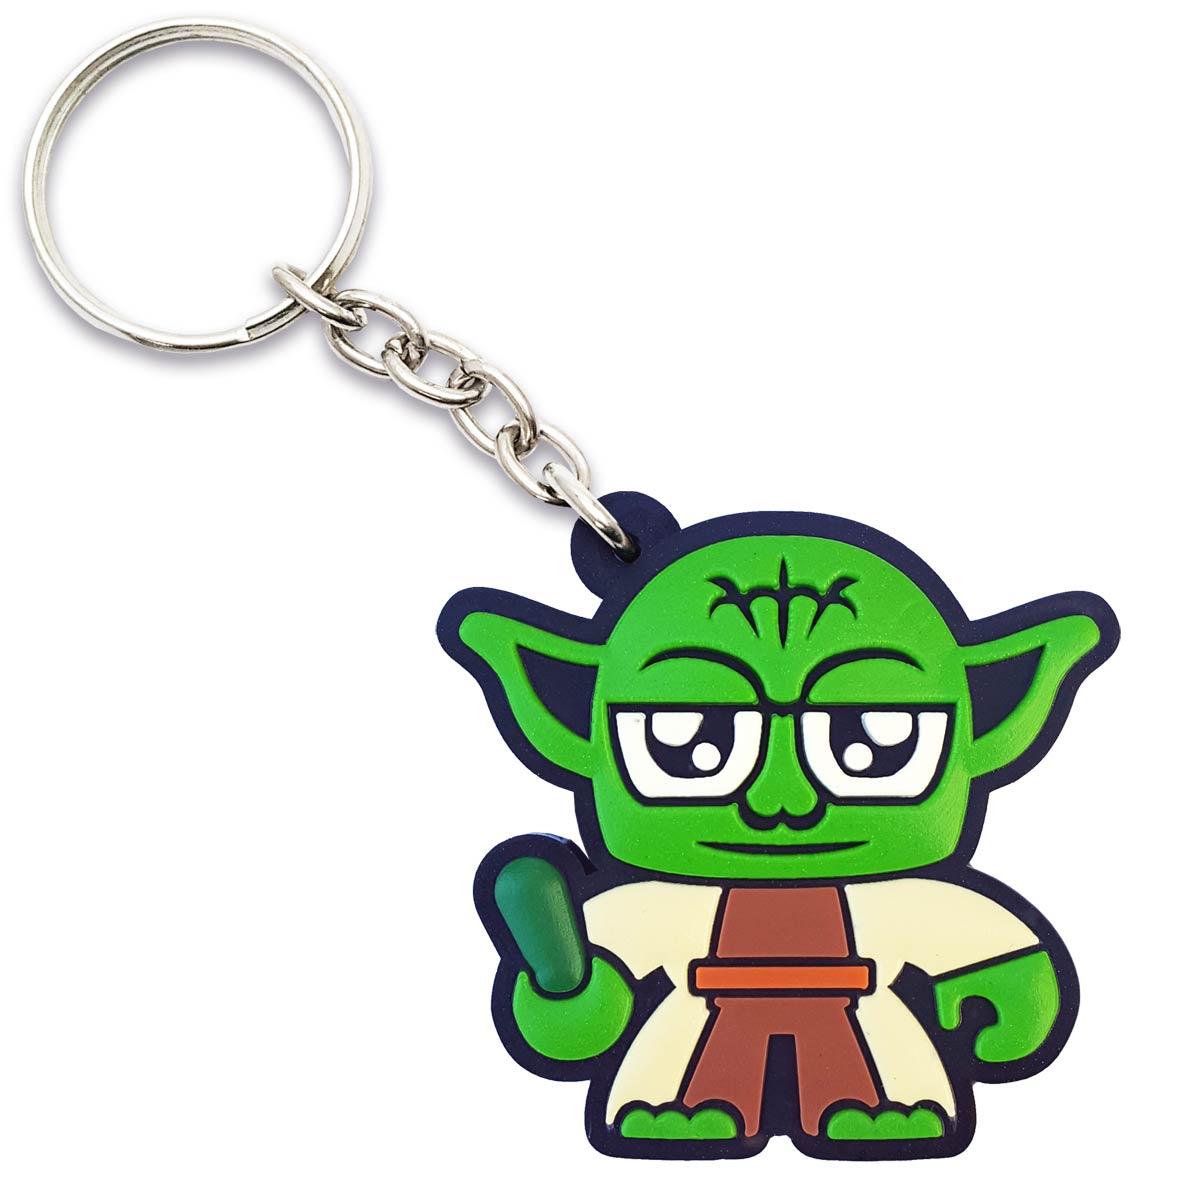 Chaveiro Geek Side - Mestre Yoda